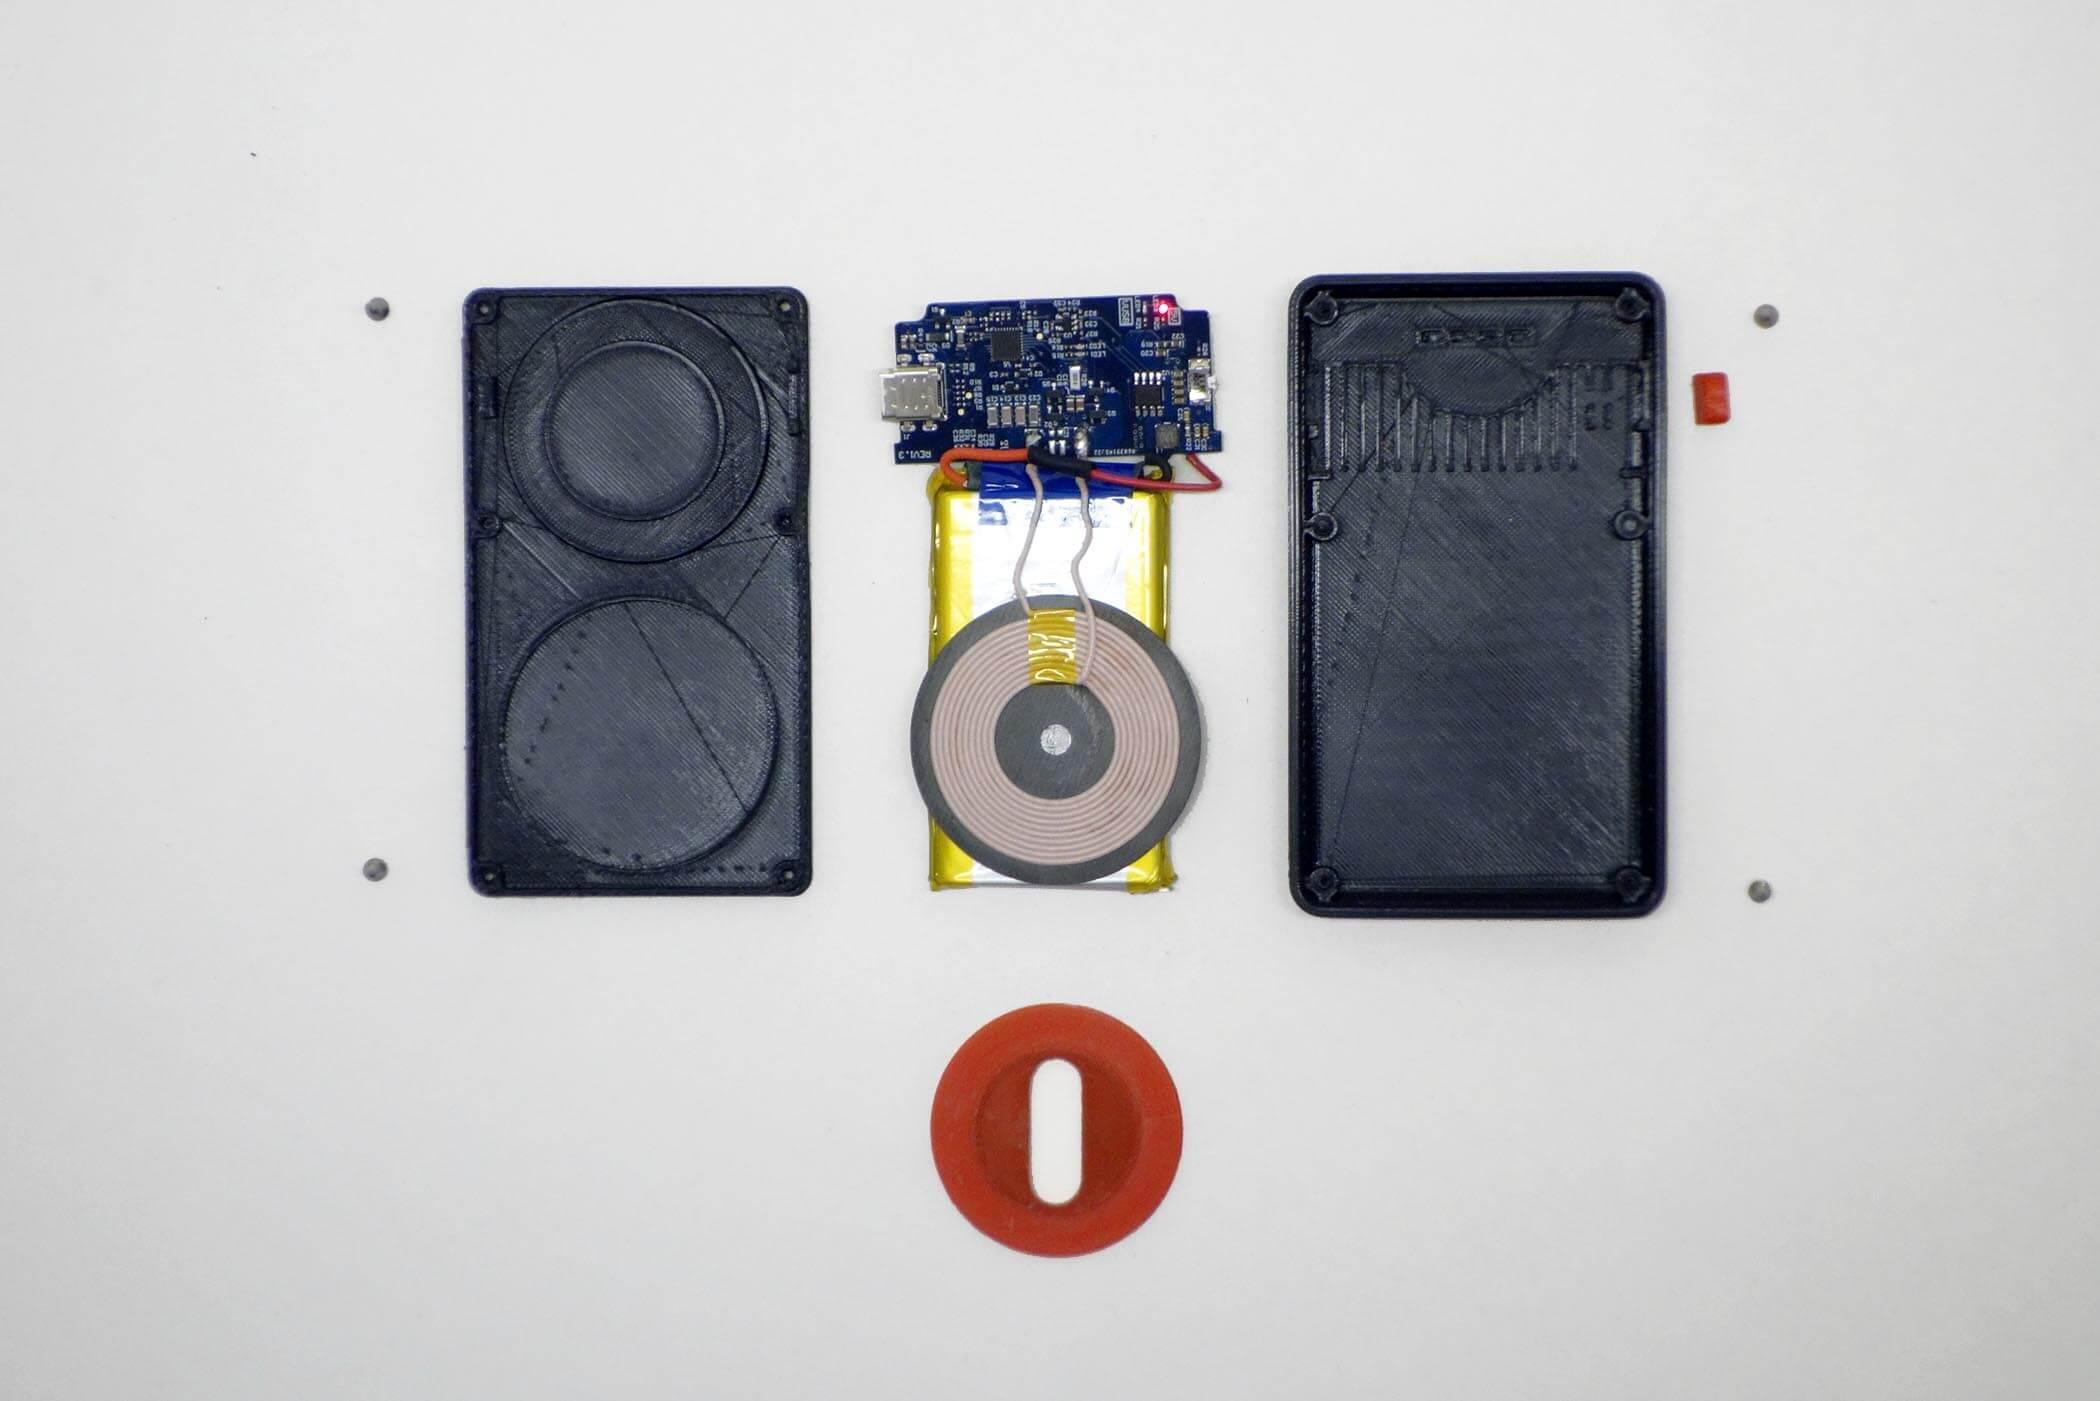 pcb design and prototype